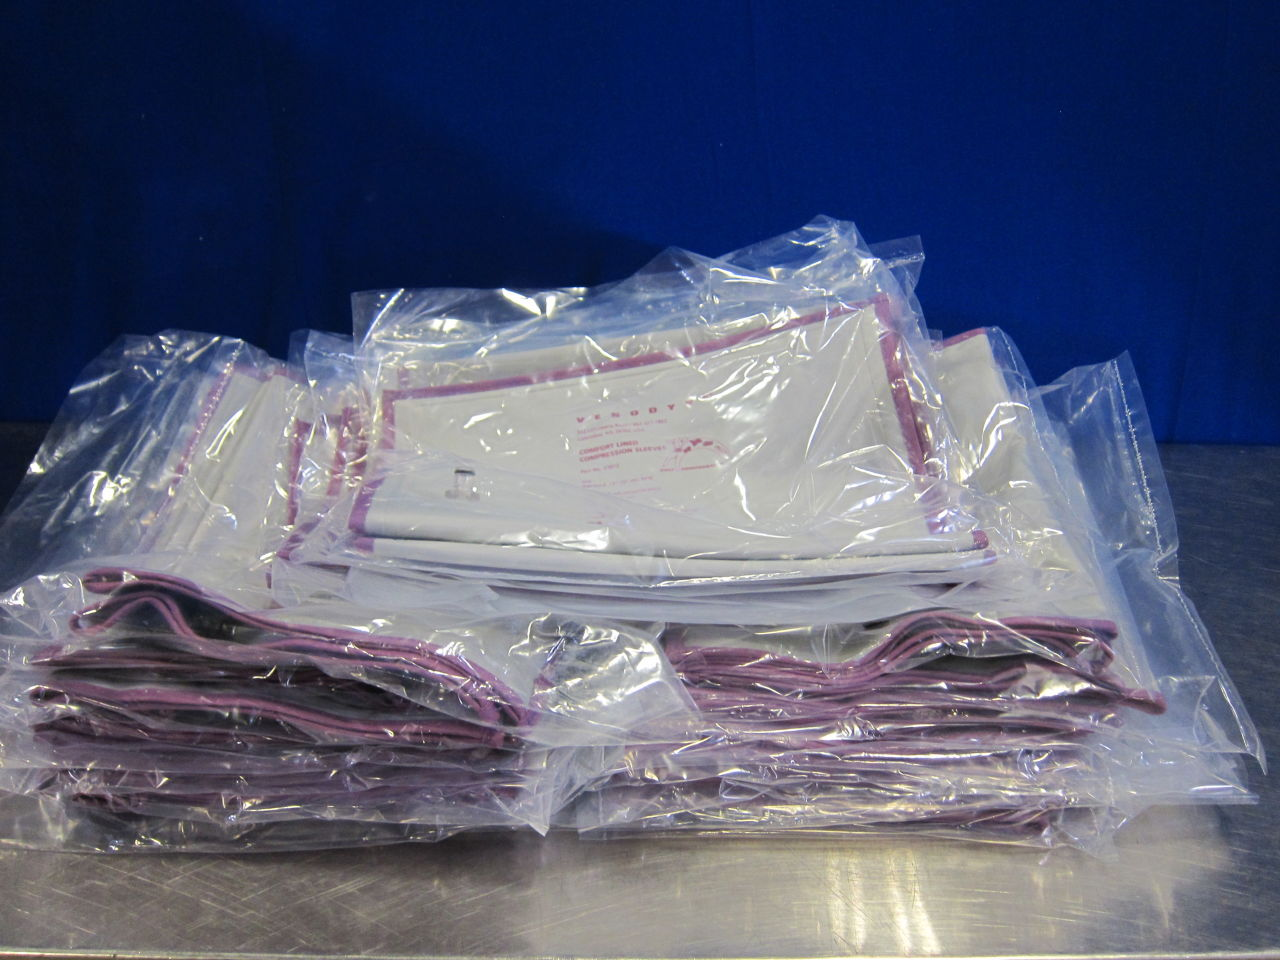 MICROTEK MEDICAL VIA VENODYNE Standard Comfort Lined  - Lot of 2